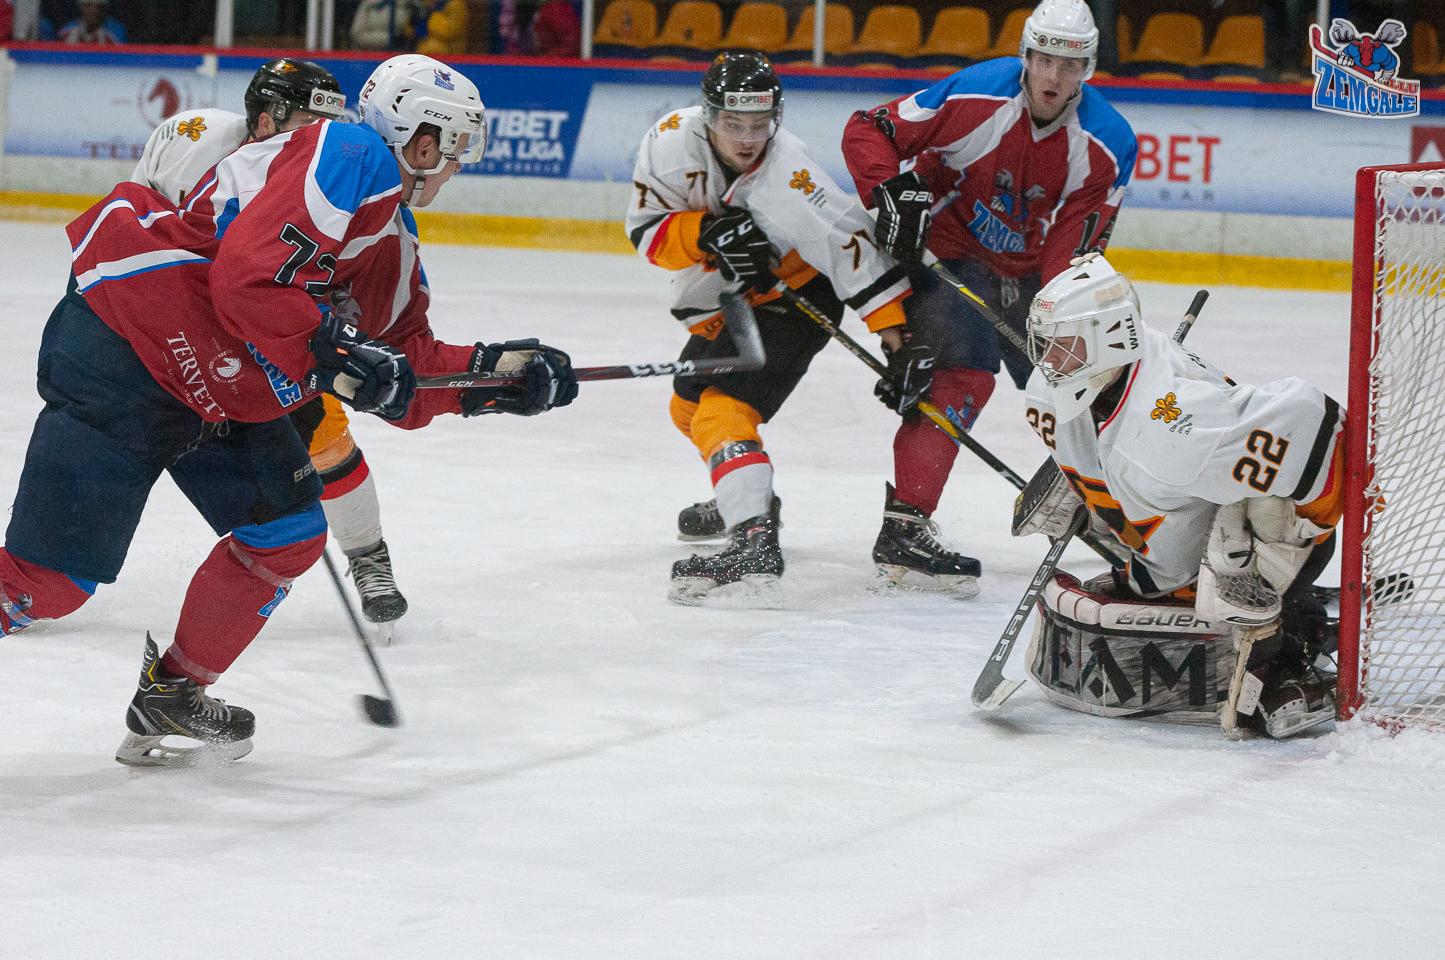 Hokejisti un vārtsargs